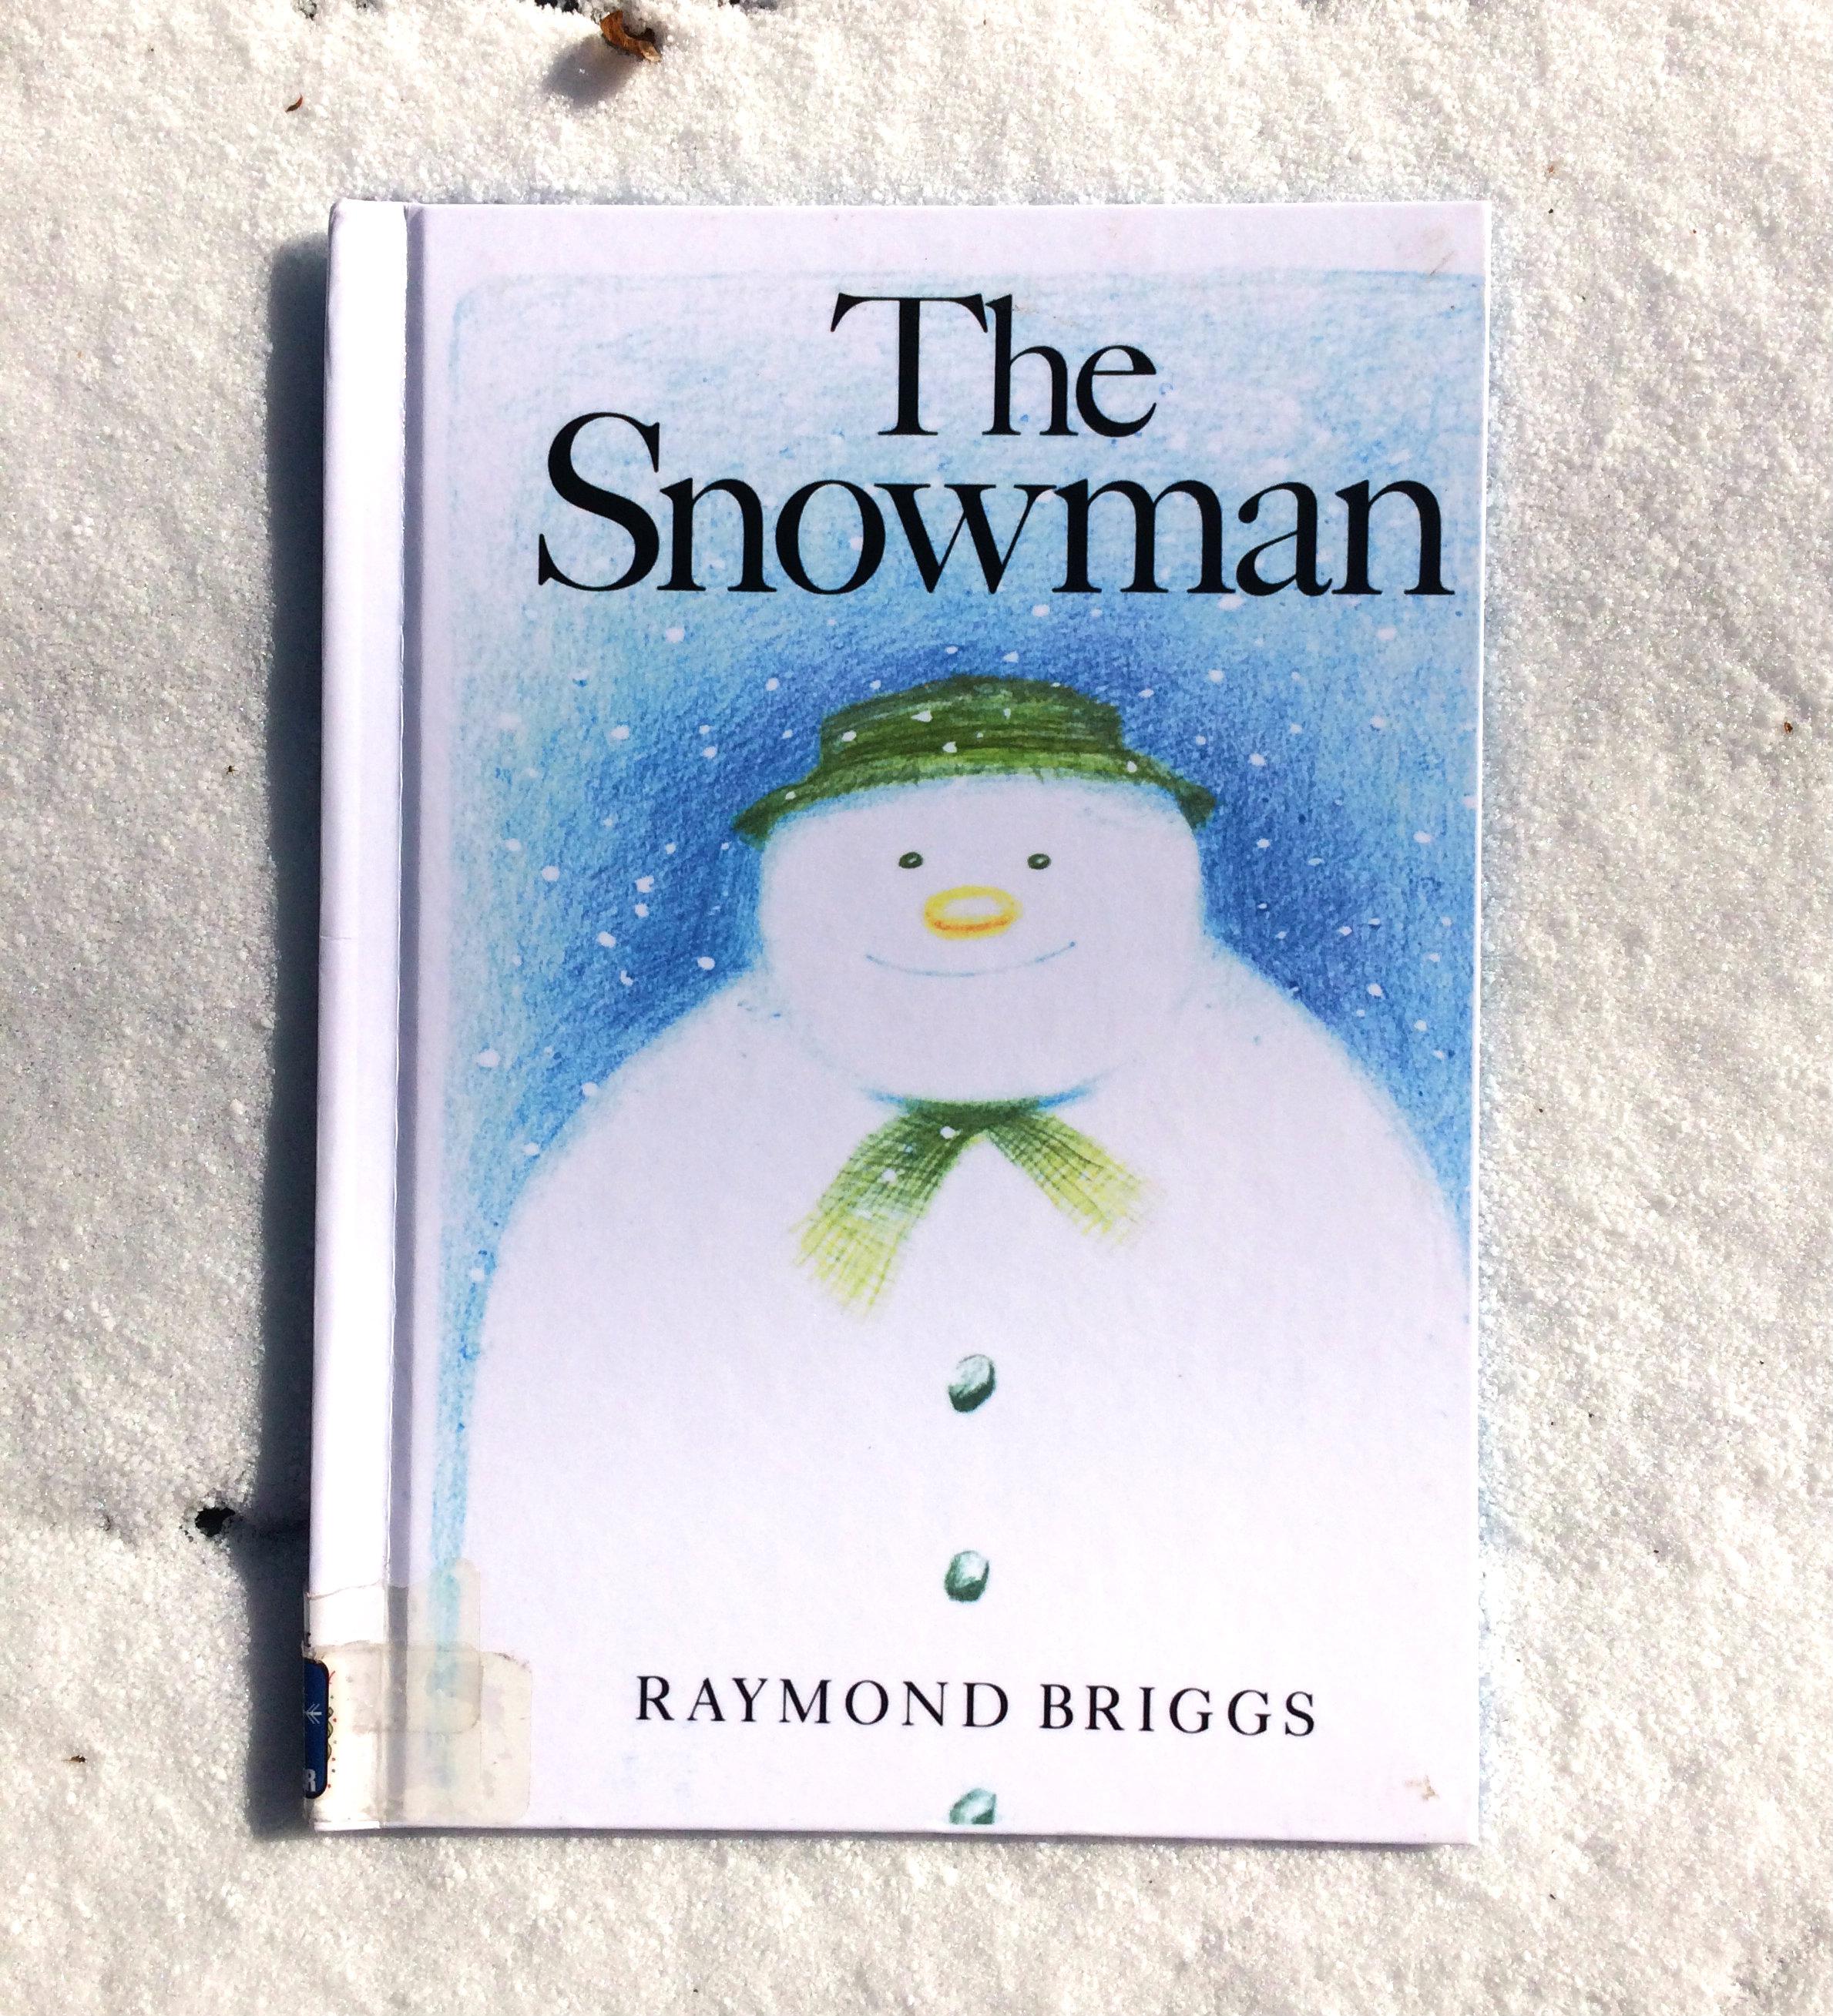 The Snowman edited.jpg